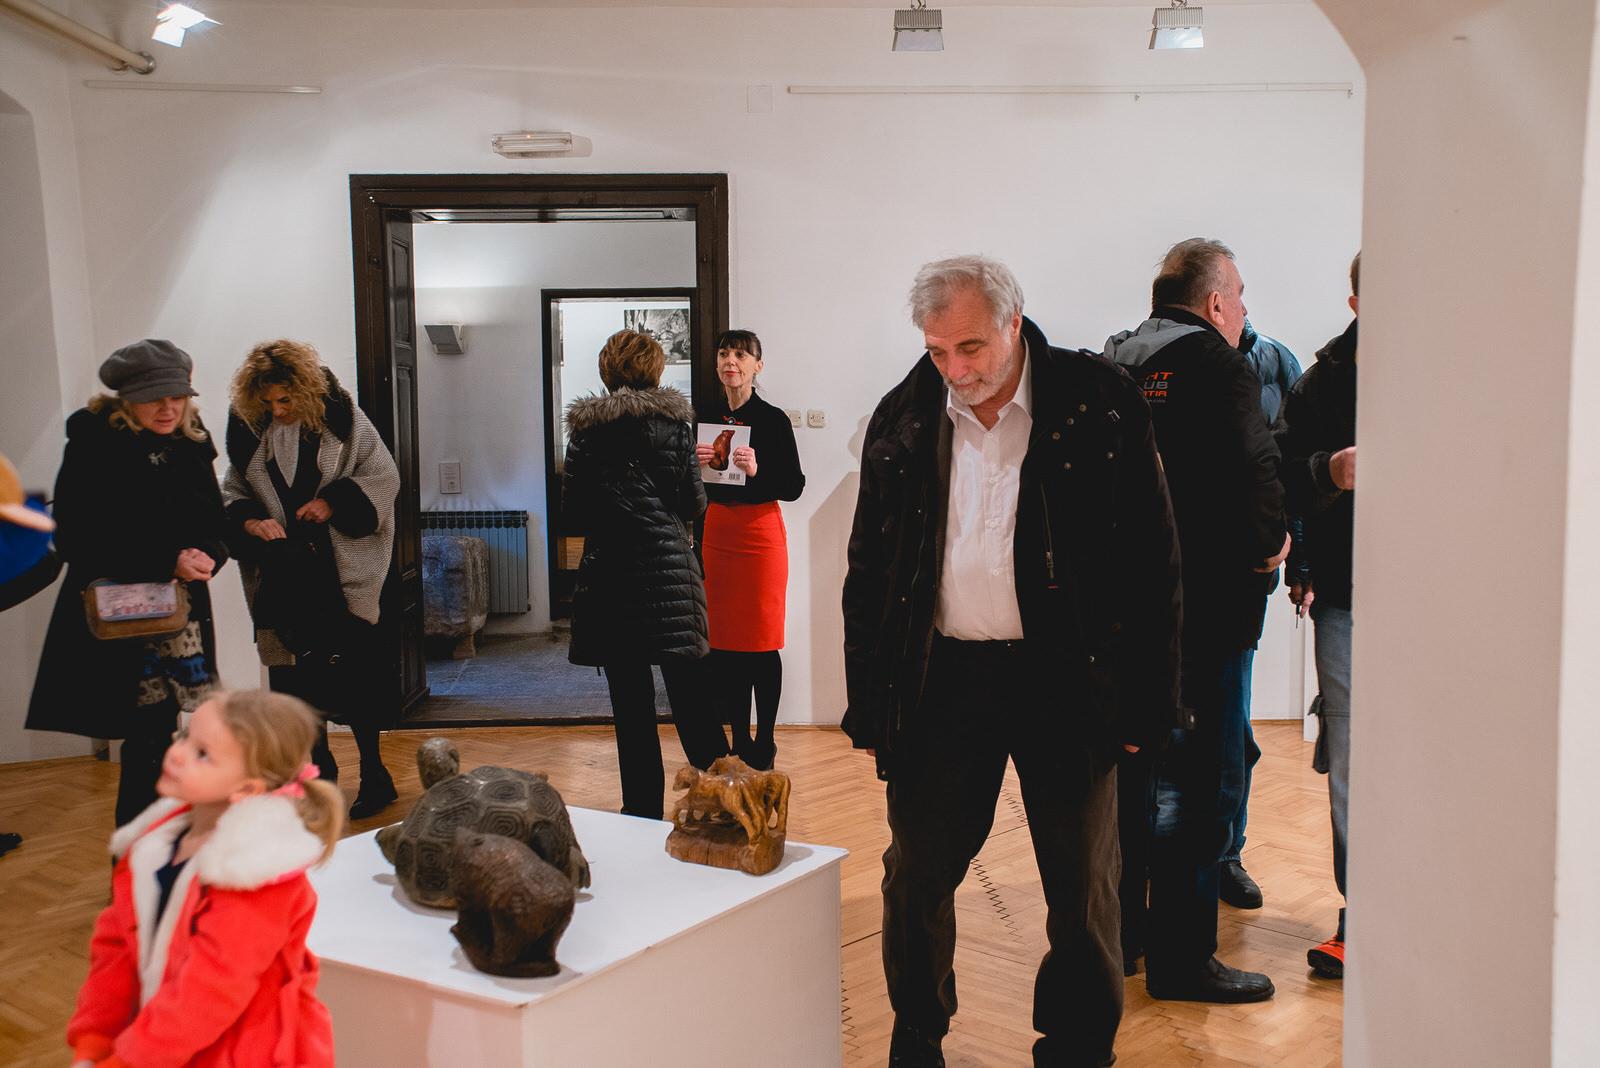 likaclub_gospić_izložba-poetika-skulpture-u-drvu_2019-4